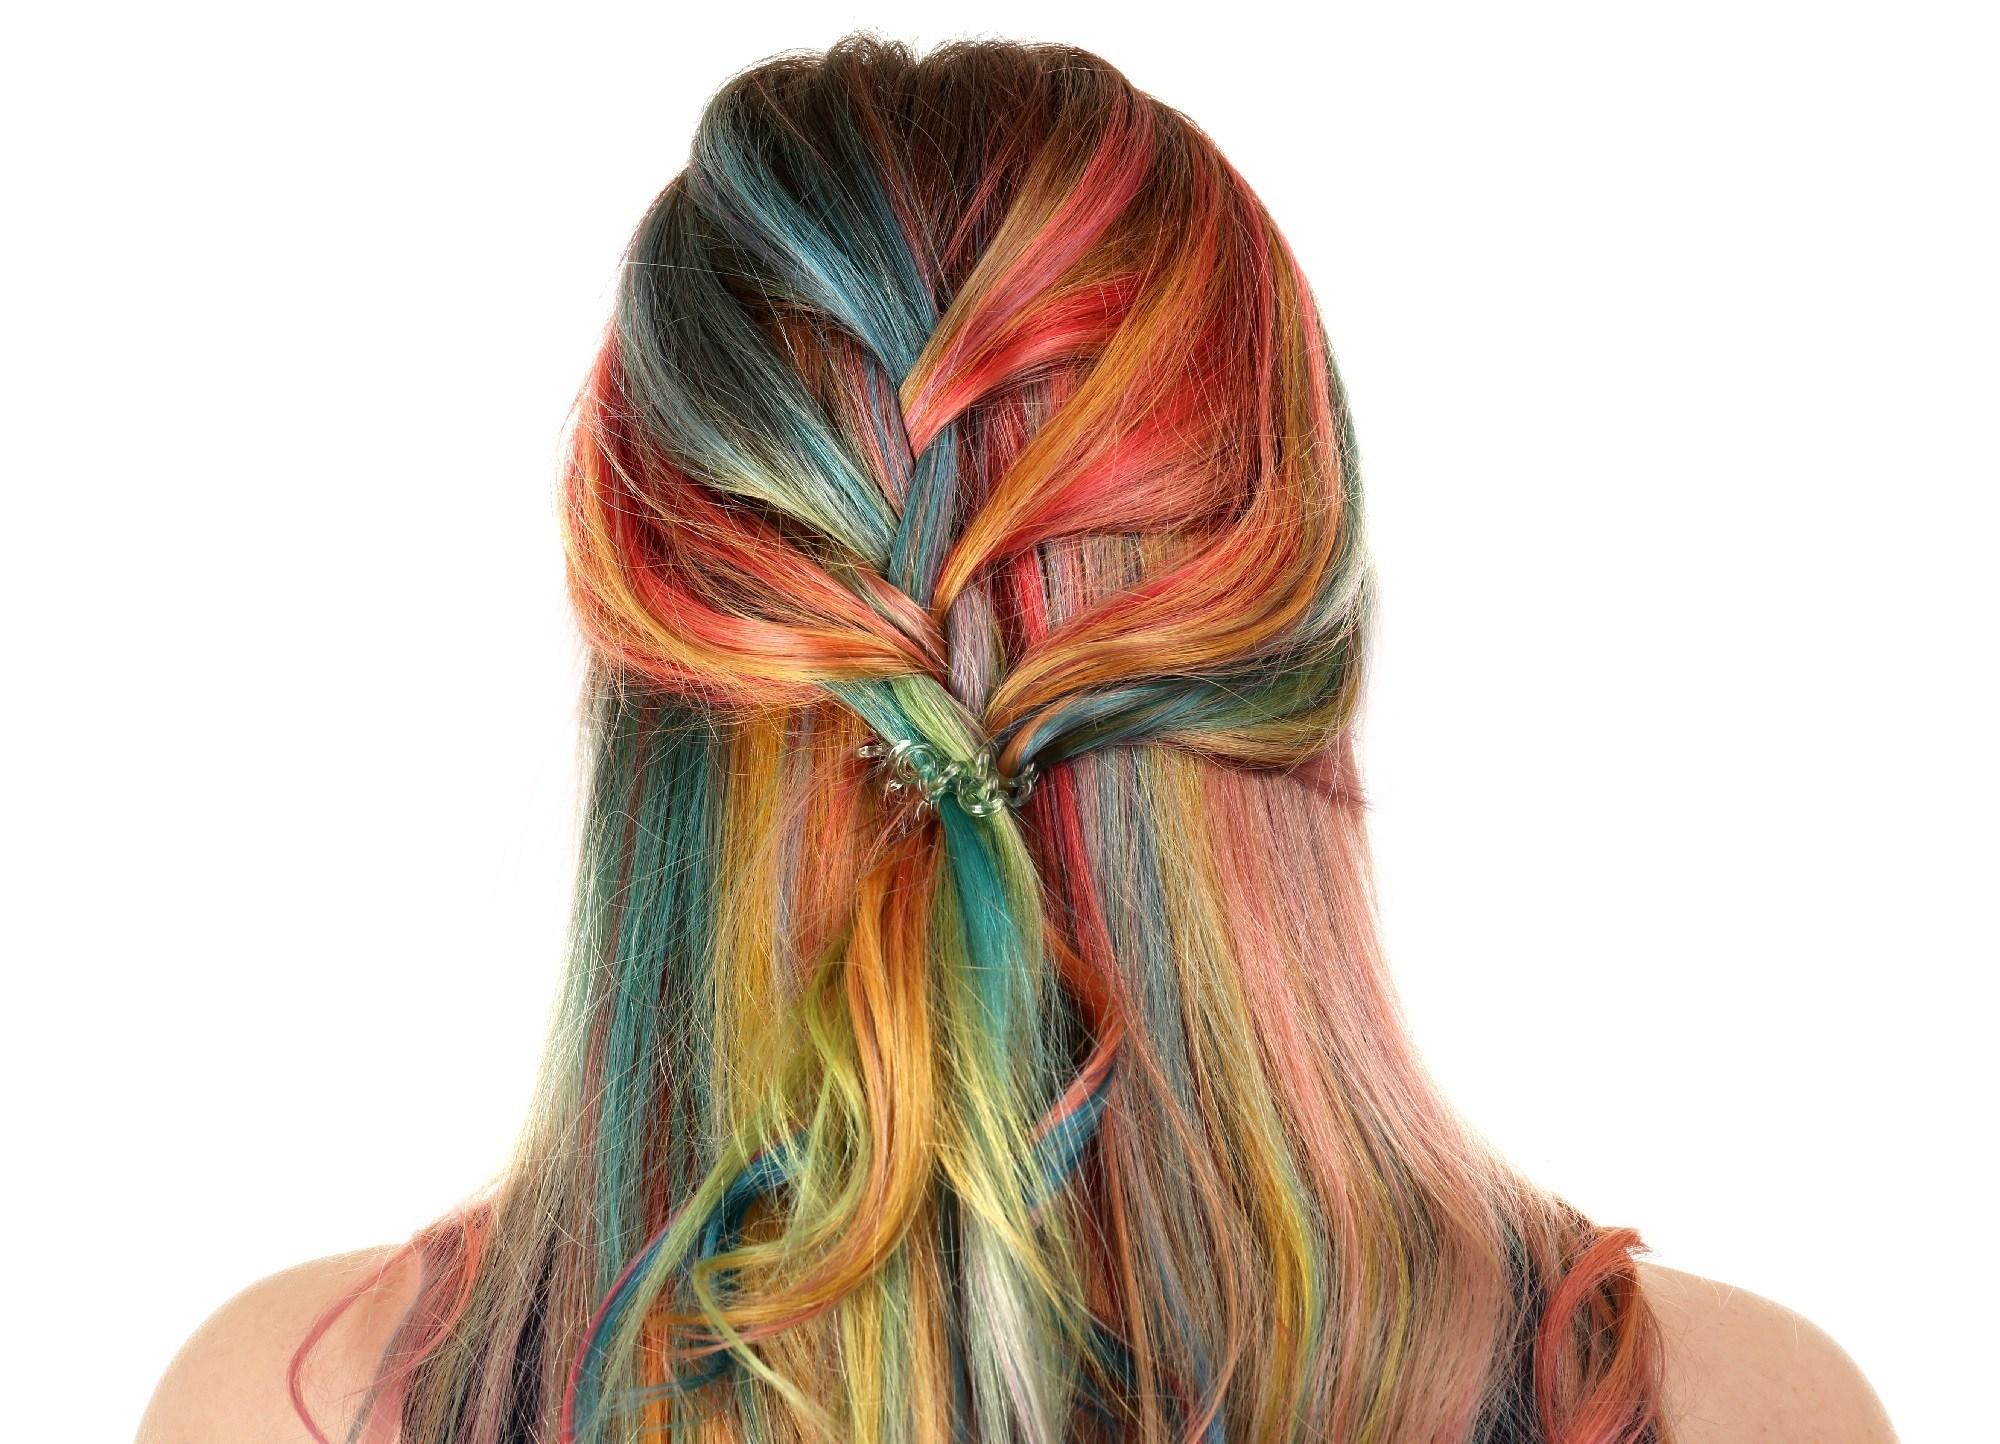 Rainbow hair color ideas - Braids Shutterstock